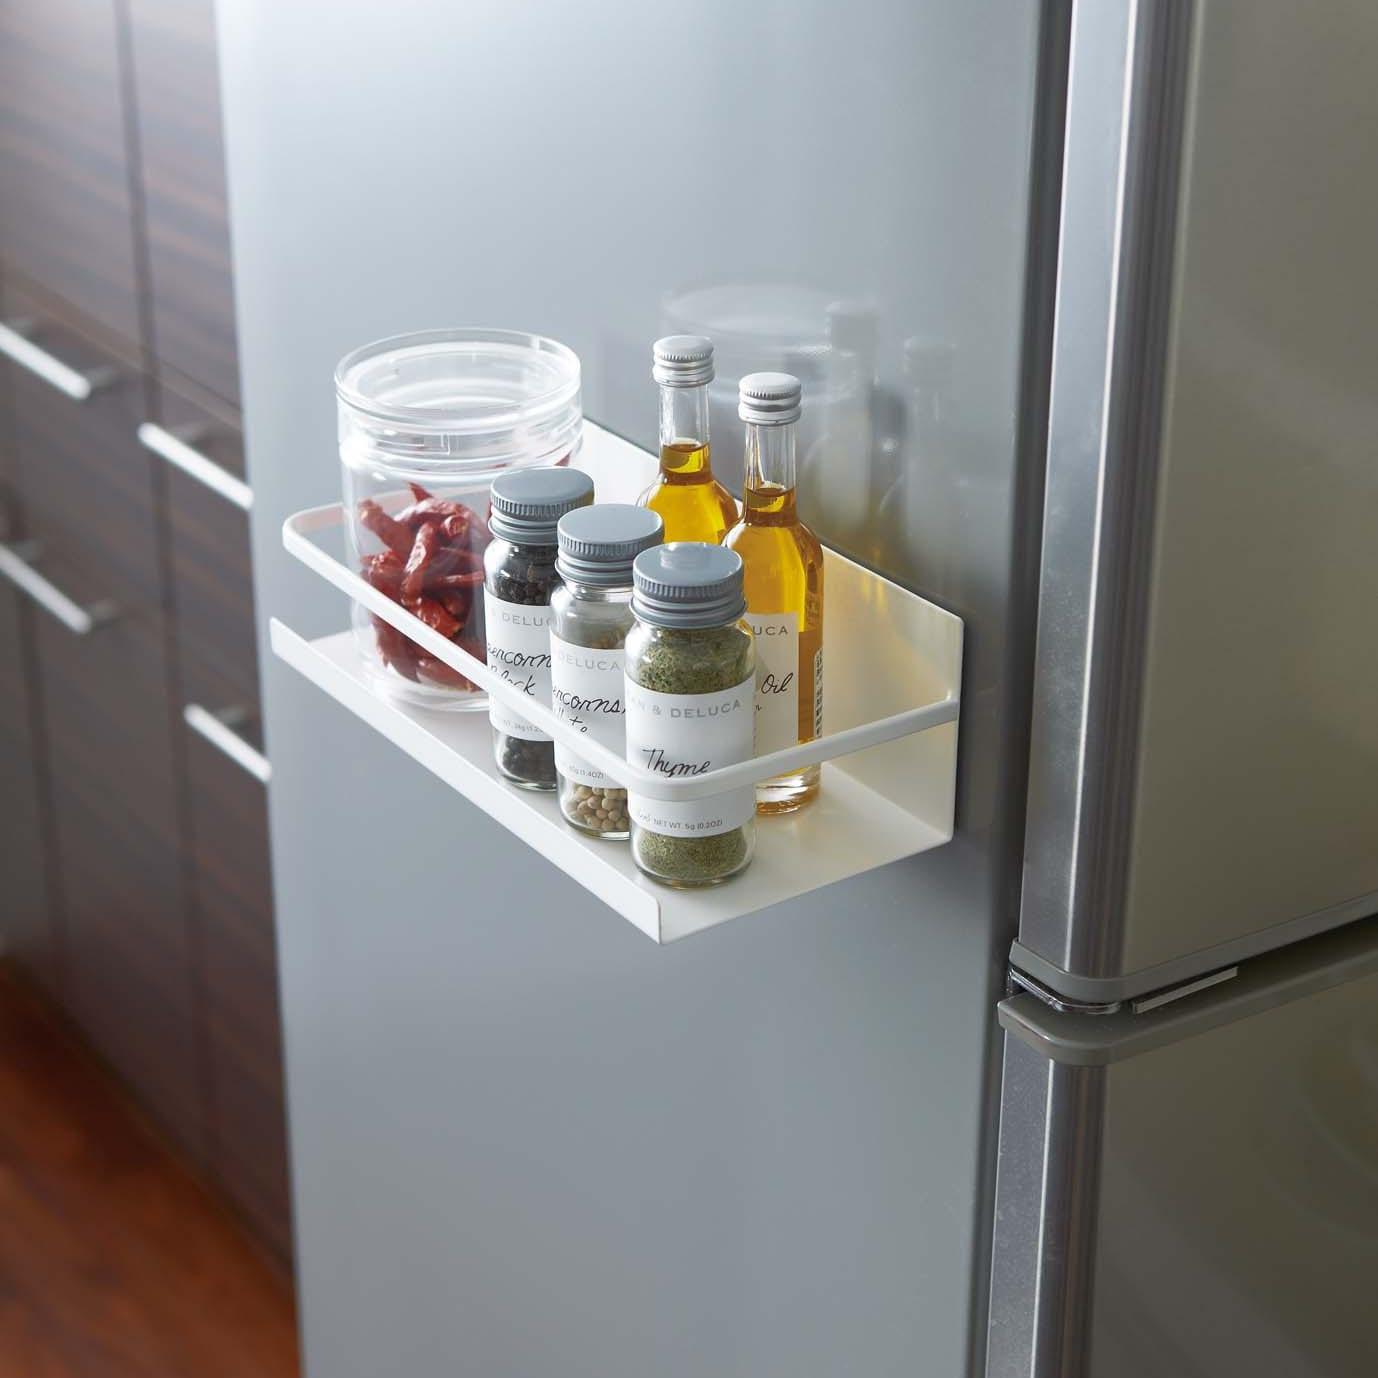 Buy Spice Racks Online at Overstock.com | Our Best Kitchen Storage Deals